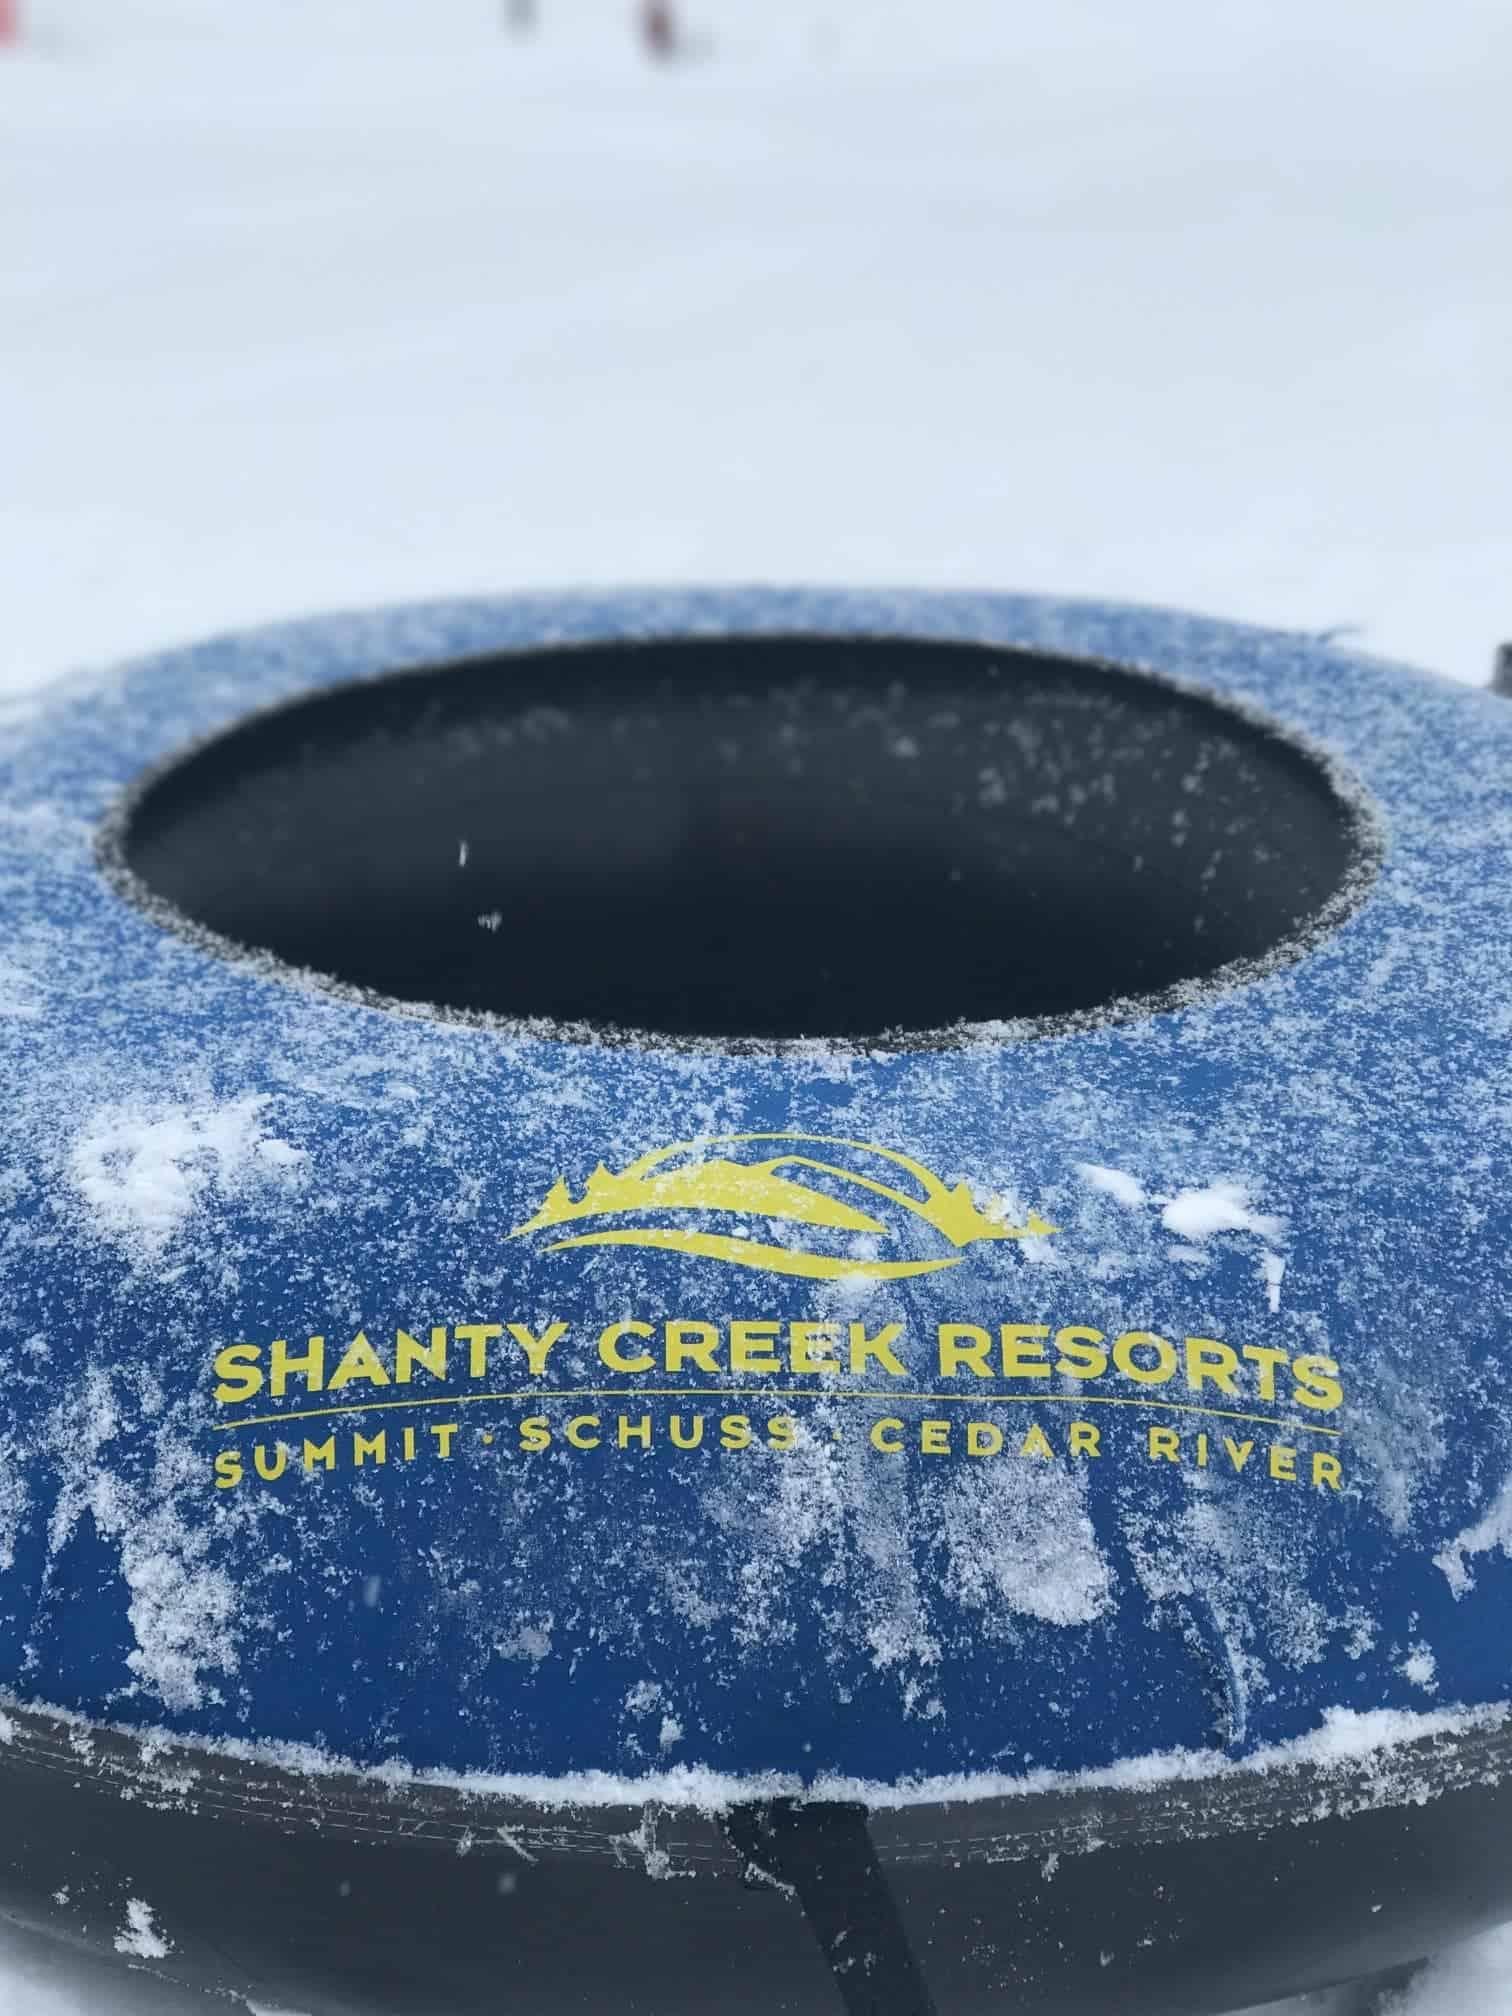 Winter fun at Shanty Creek Resorts!